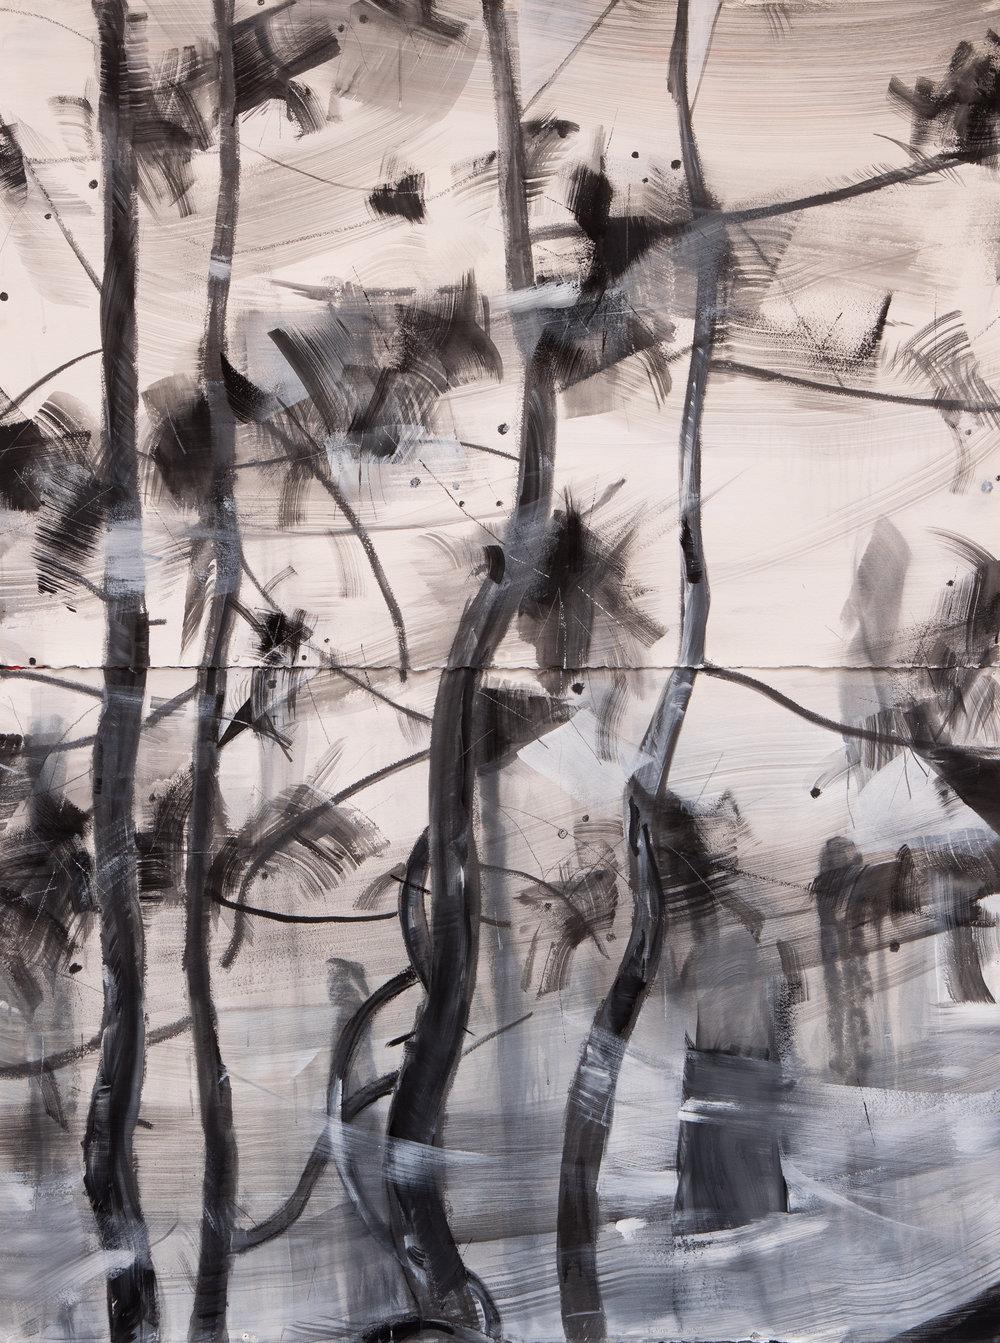 Restless, Zahnjiajie, 2018, acrylic, graphite on unprimed 640 gsm arches, 204 x 153 cm.jpg